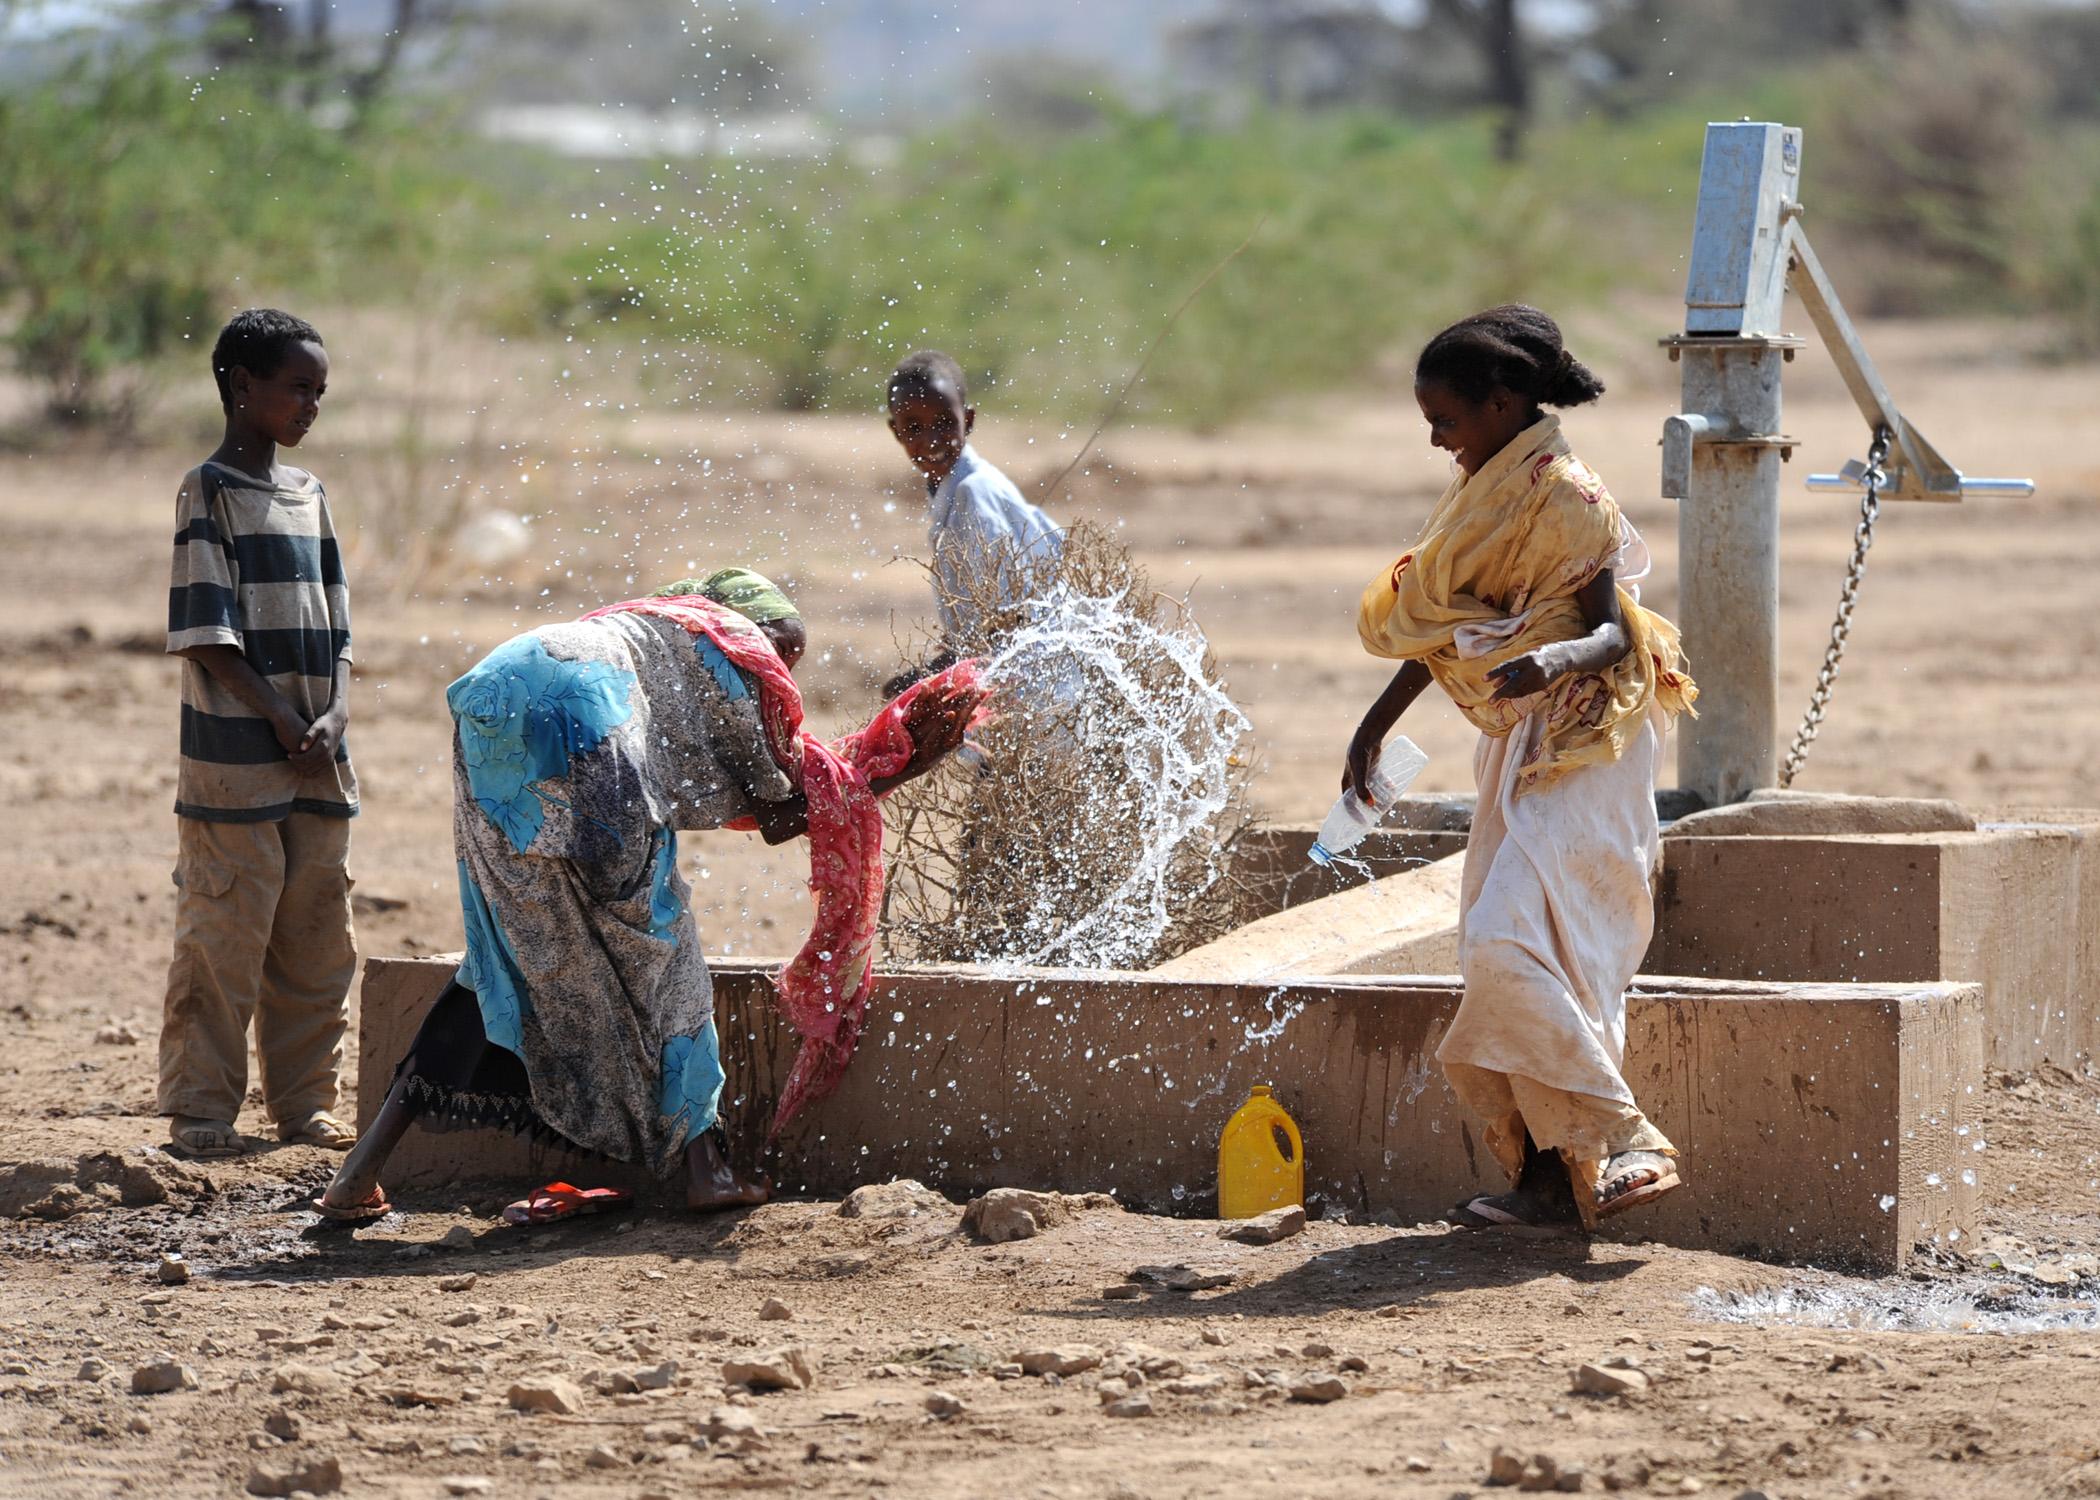 Description us navy 110311 n sn160 227 ethiopian children play in the